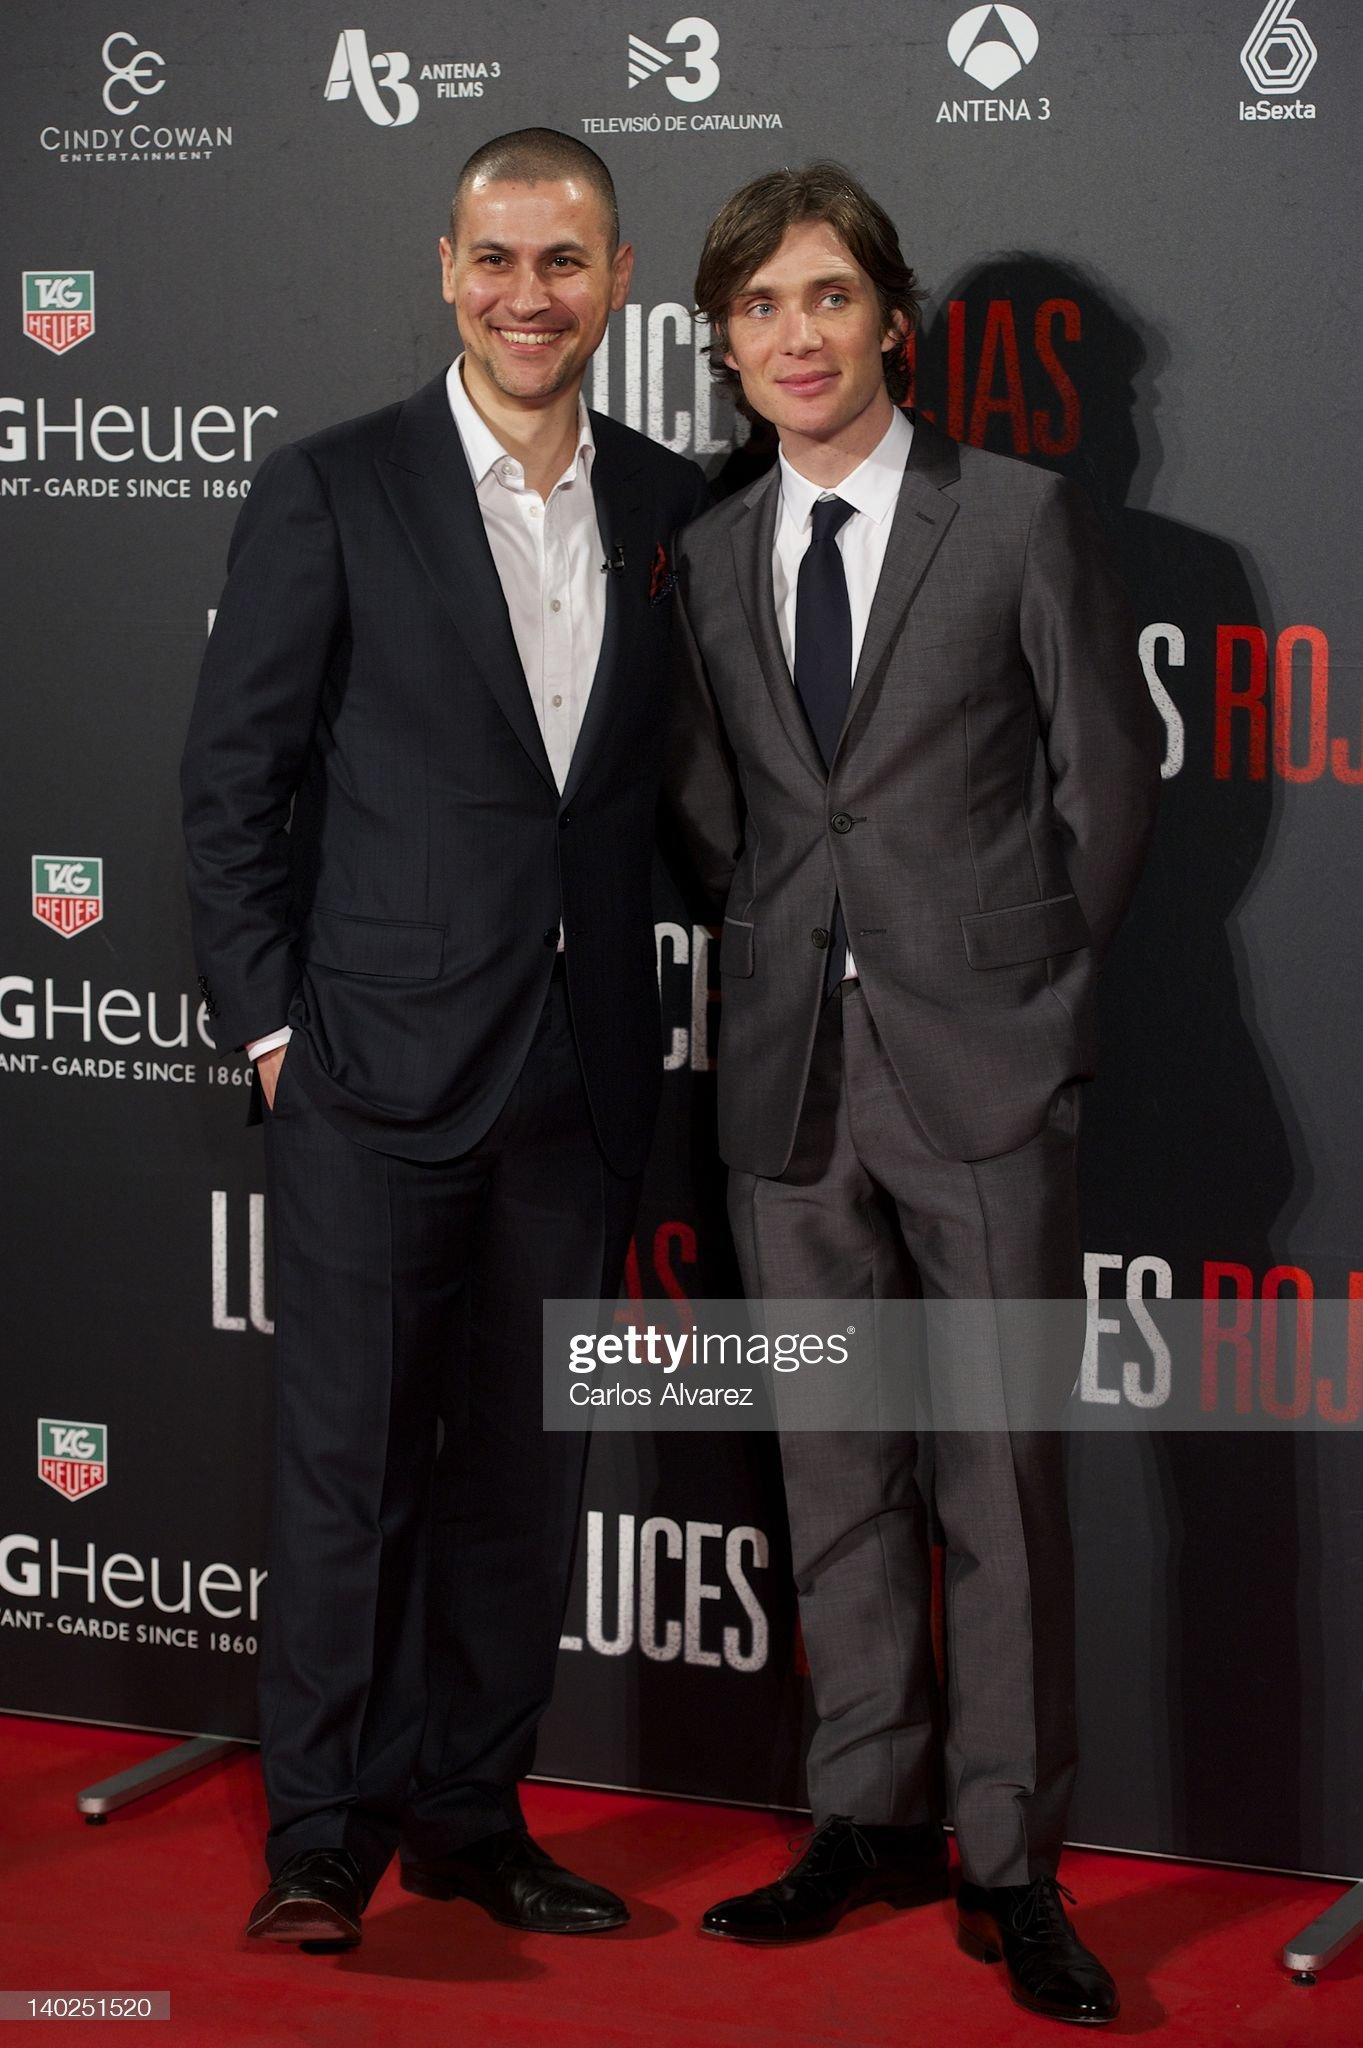 ¿Cuánto mide Rodrigo Cortés? - Altura Spanish-director-rodrigo-cortes-and-actor-cillian-murphy-attend-red-picture-id140251520?s=2048x2048